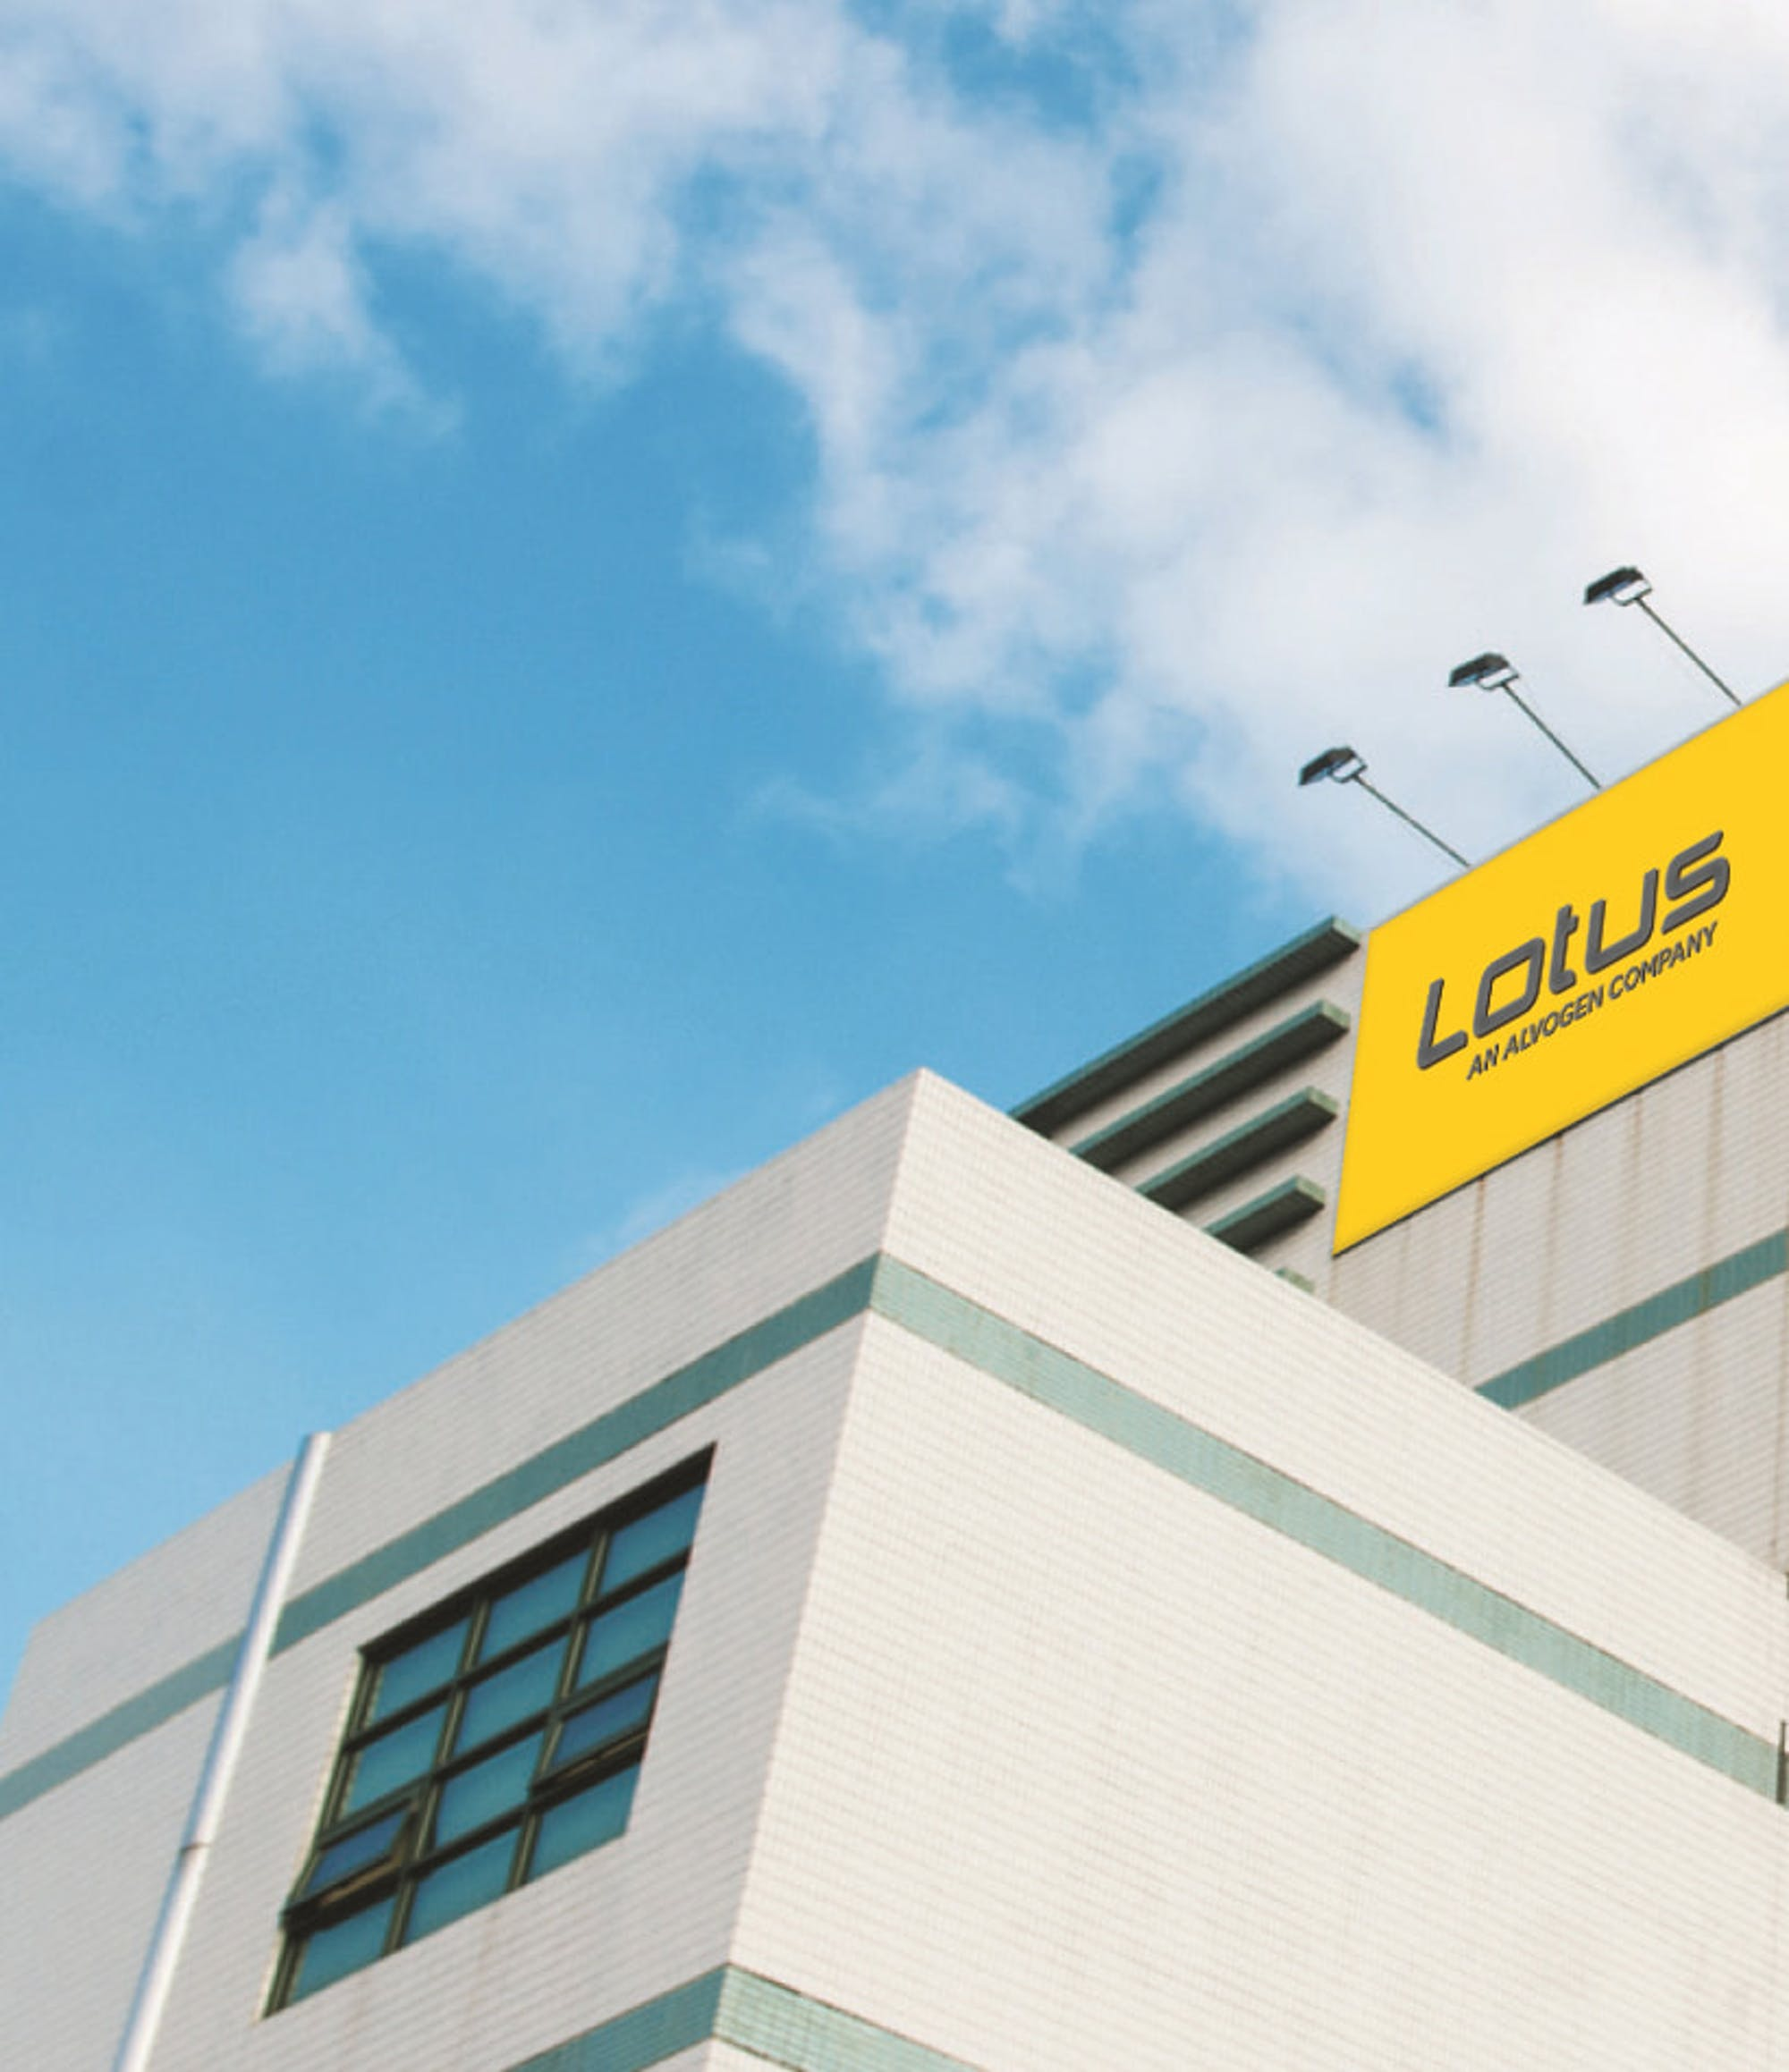 Lotus building